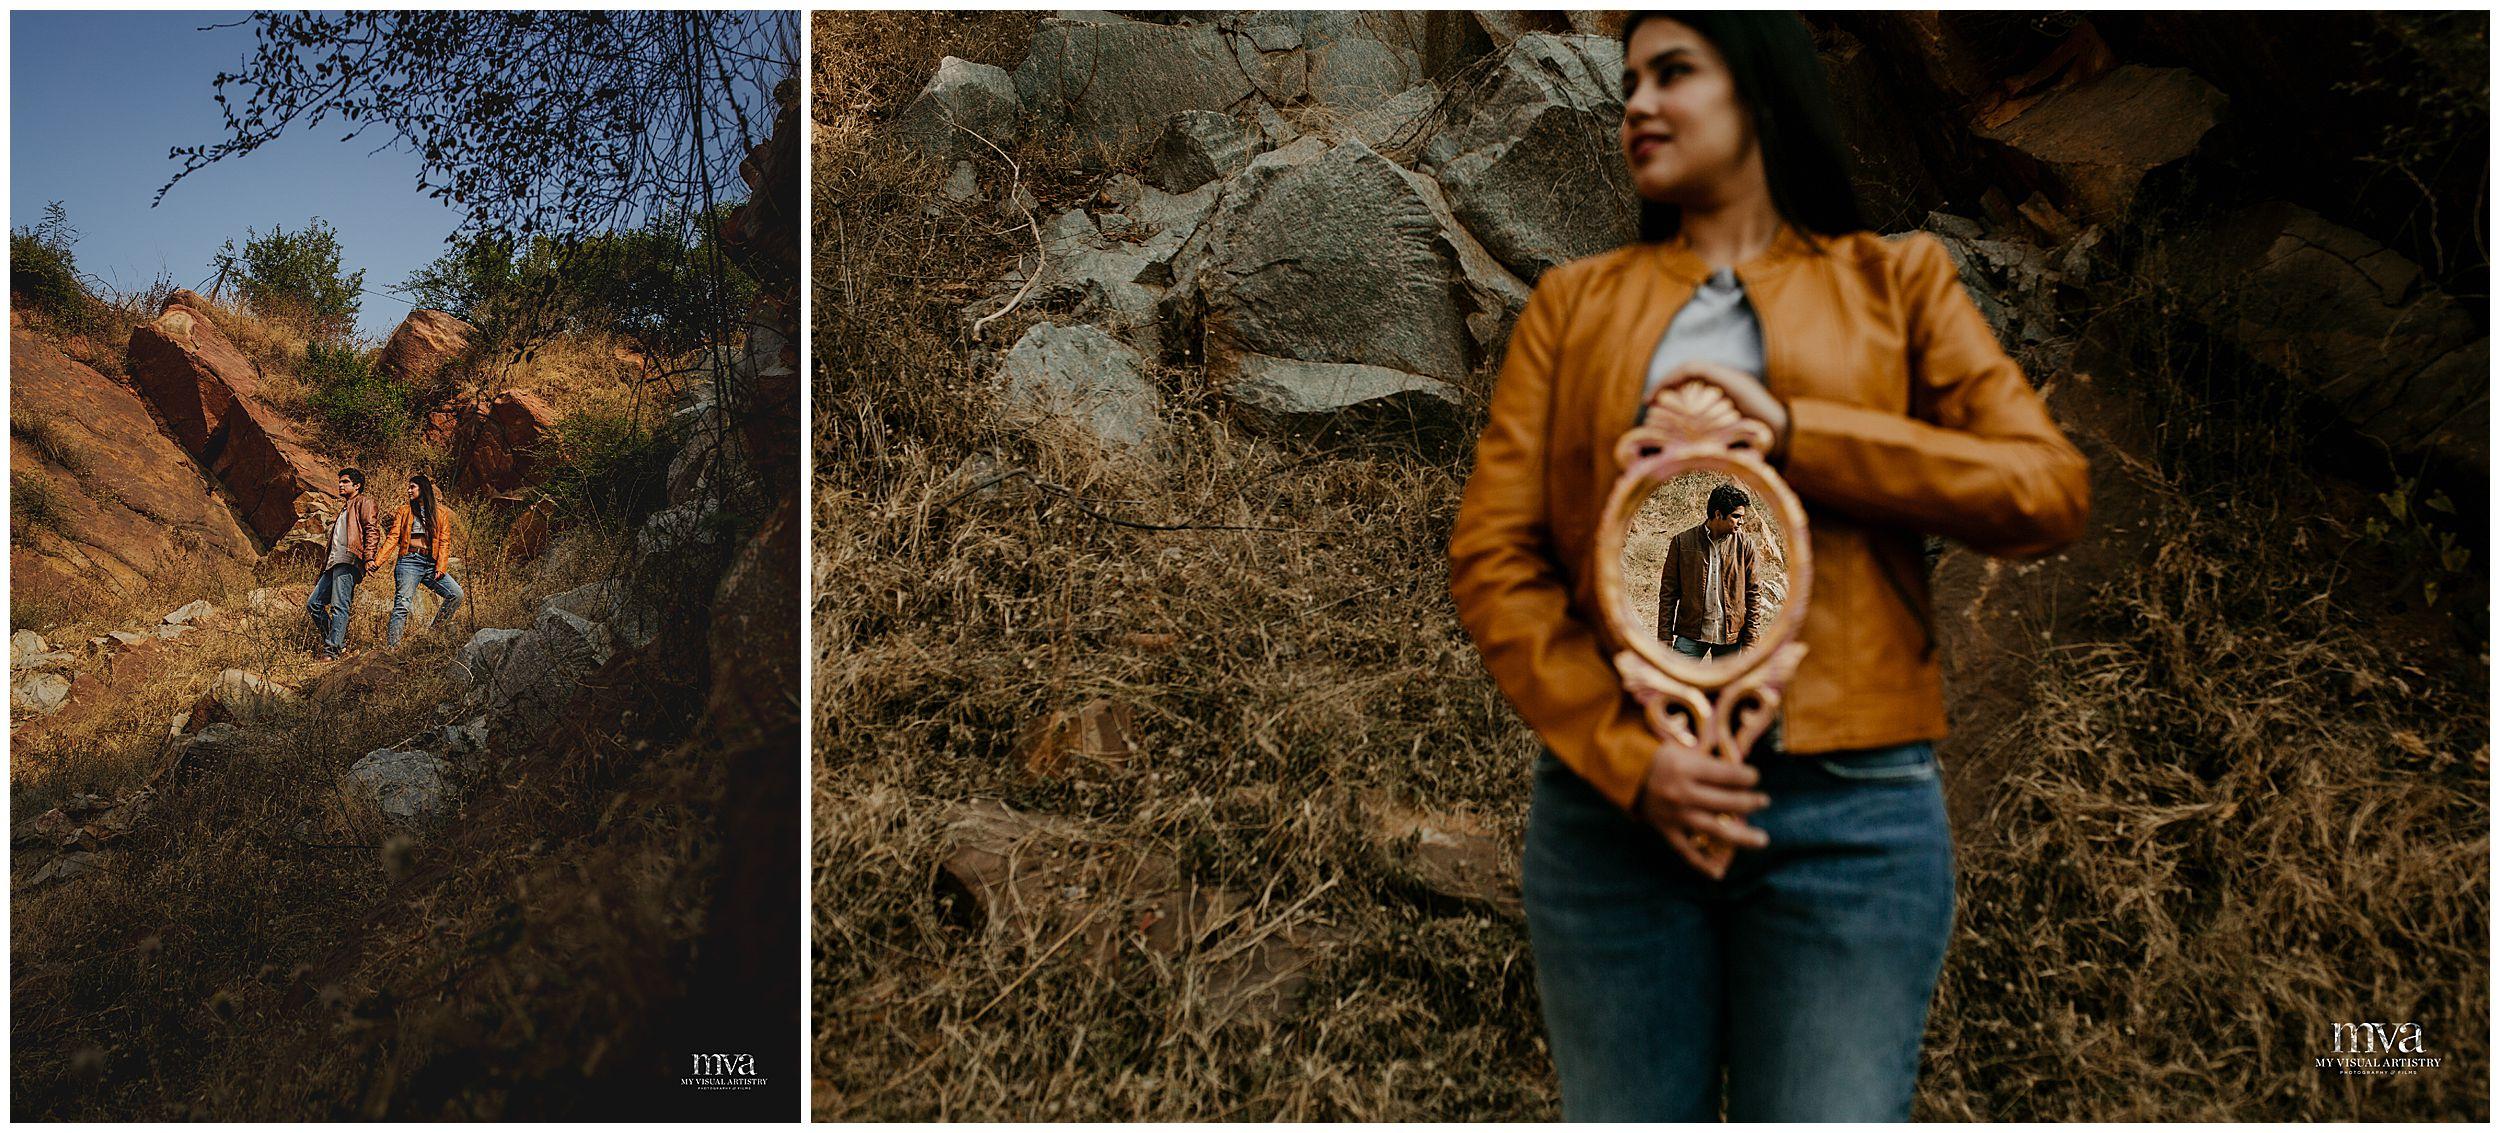 SAHIL_MANALI_MYVISUALARTISTRY__WEDDING_PHOTOGRAPHER_JANNATVALLEY_COUPLESHOOT_DESTINATION_FARIDABAD_PREWEDDING17.jpg